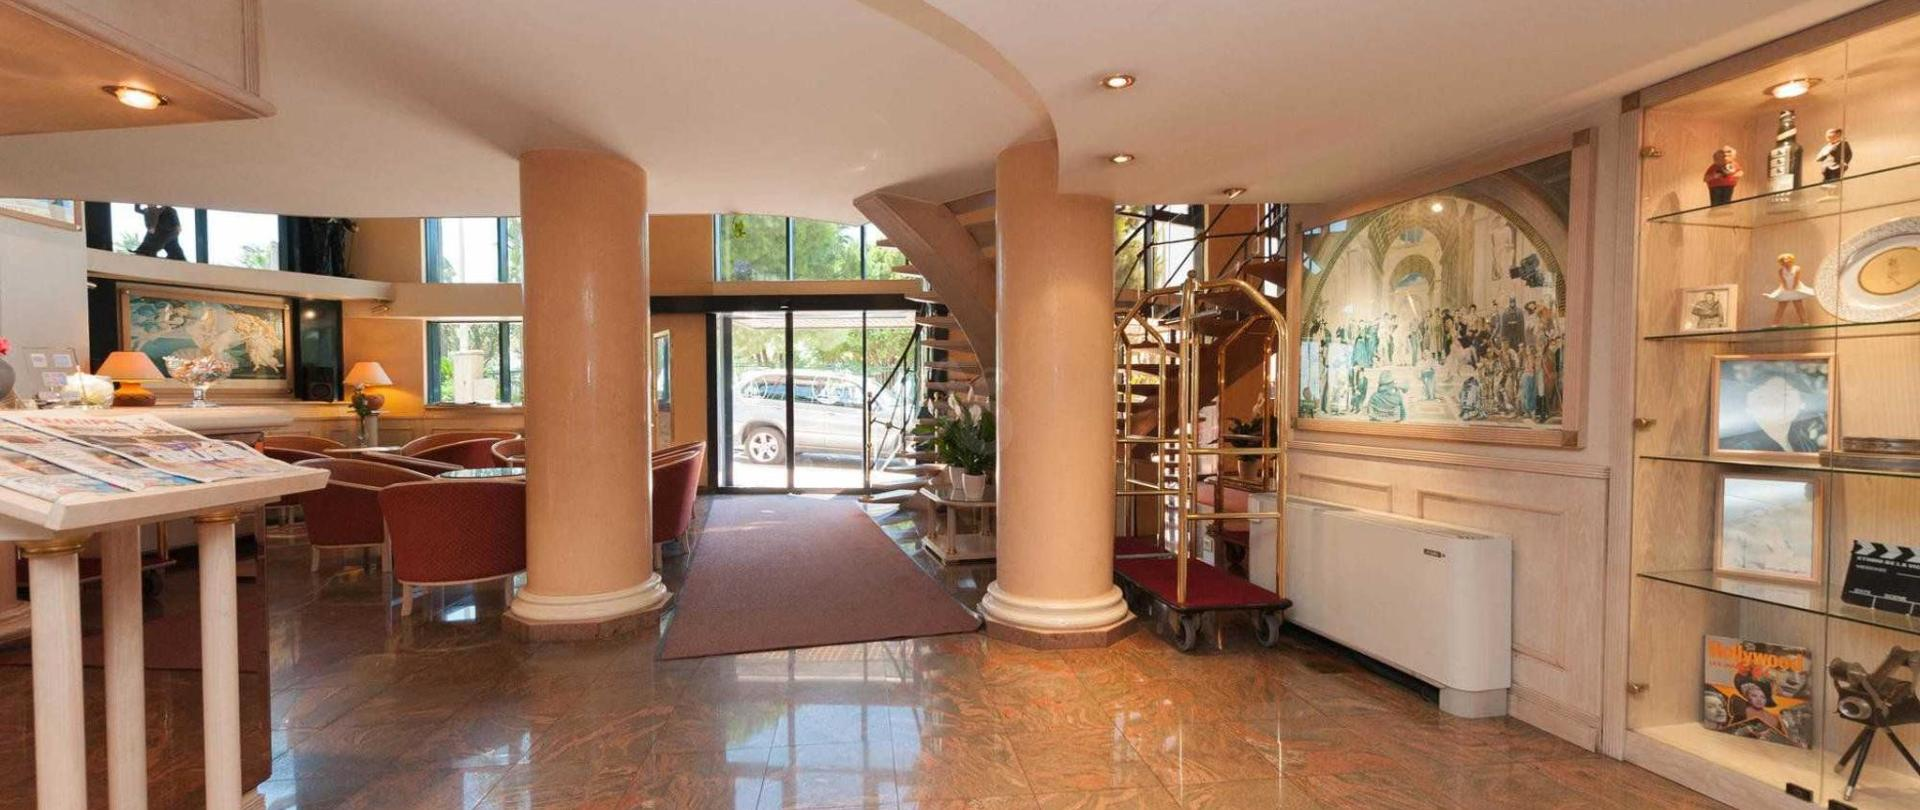 lobby-v9334155-2000.jpg